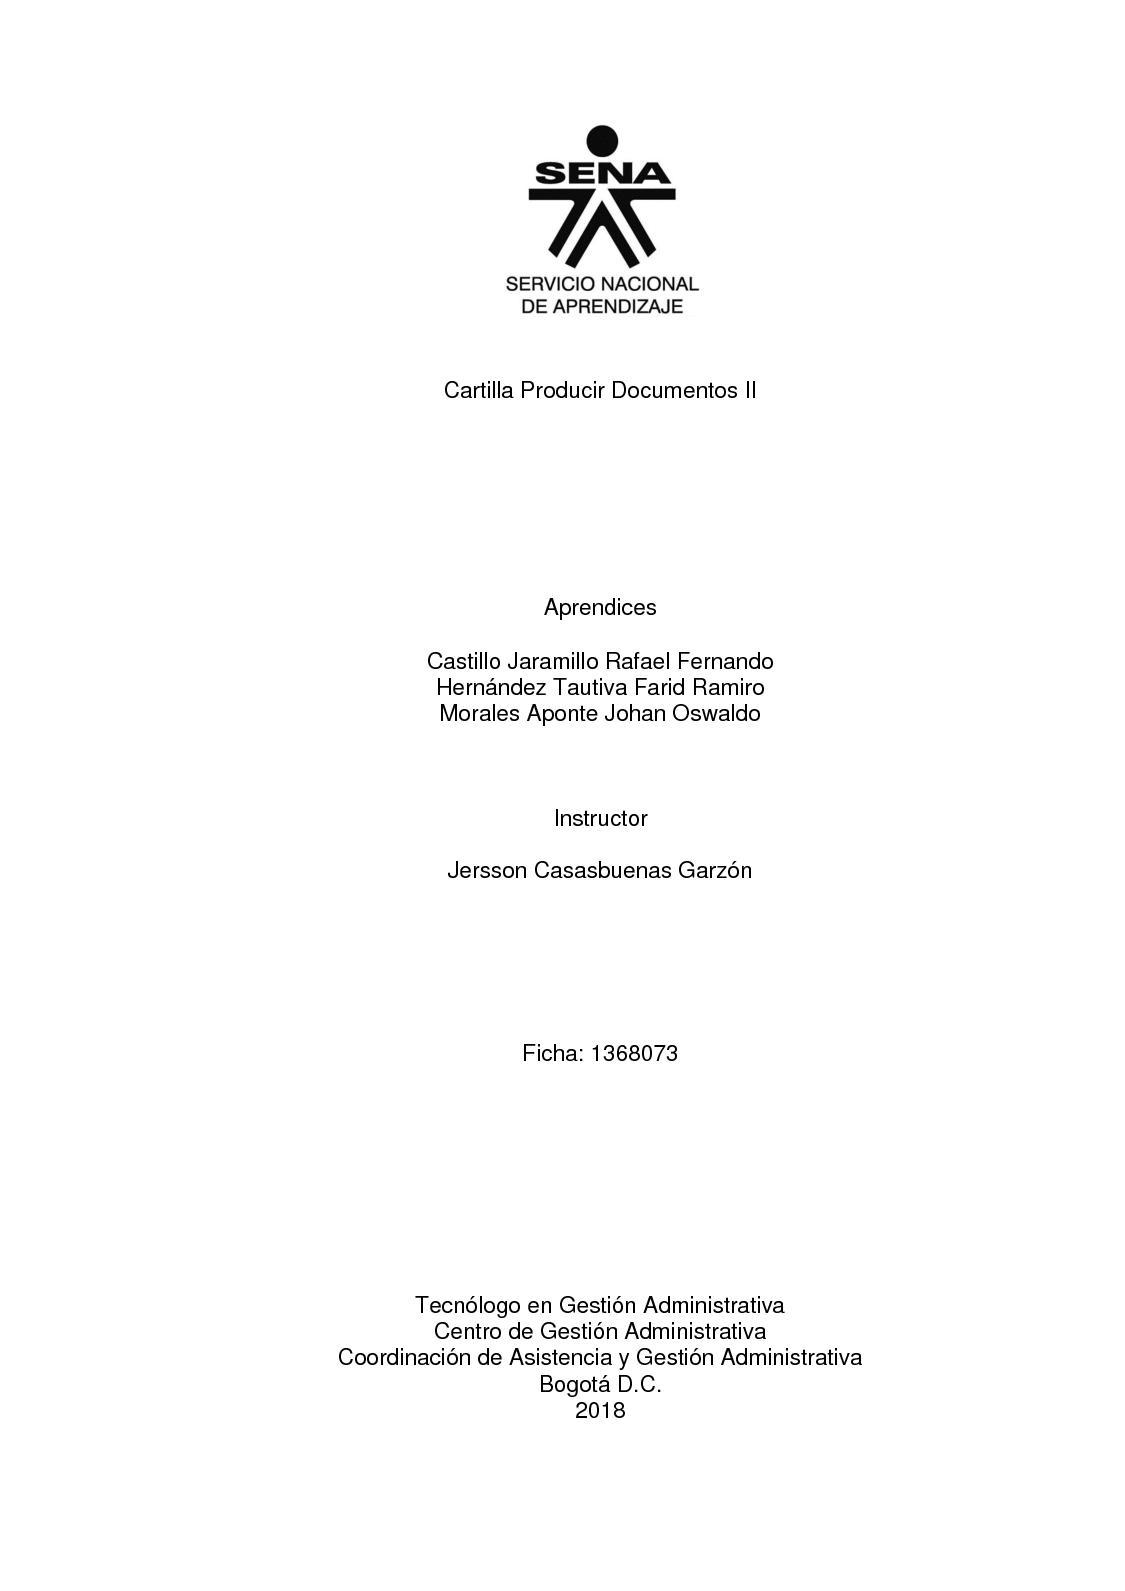 Cartilla,,finalizada Produccion Documental 2